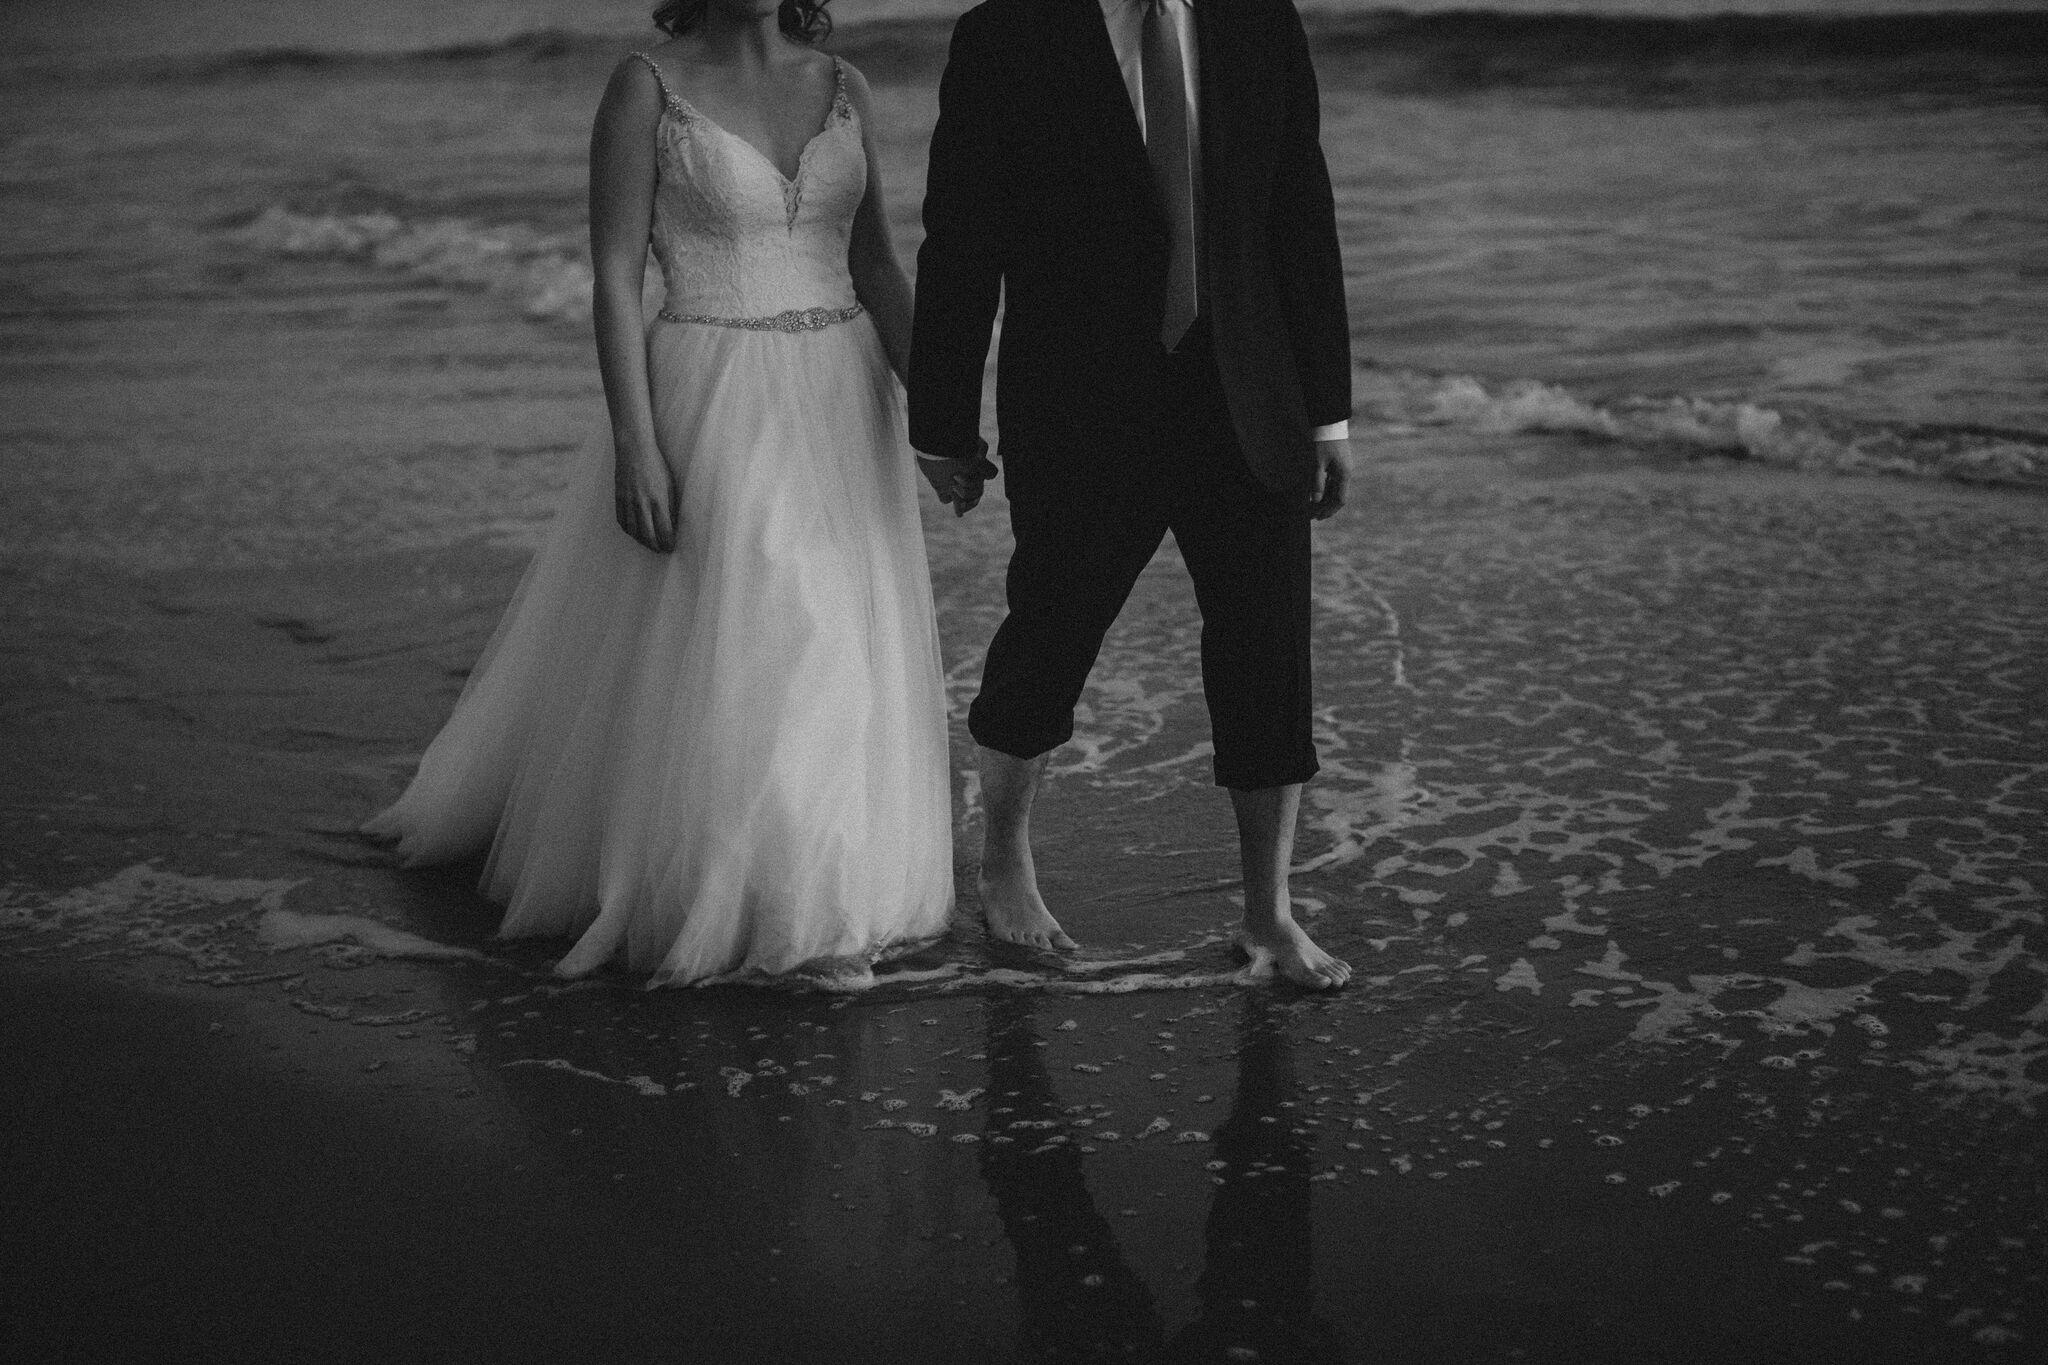 www.santabarbawedding.com | Venue: Santa Barbara Courthouse | Photography: Ryanne Bee Photography | Officiant: Santa Barbara Classic Weddings | Bride and Groom Walking Barefoot in Ocean